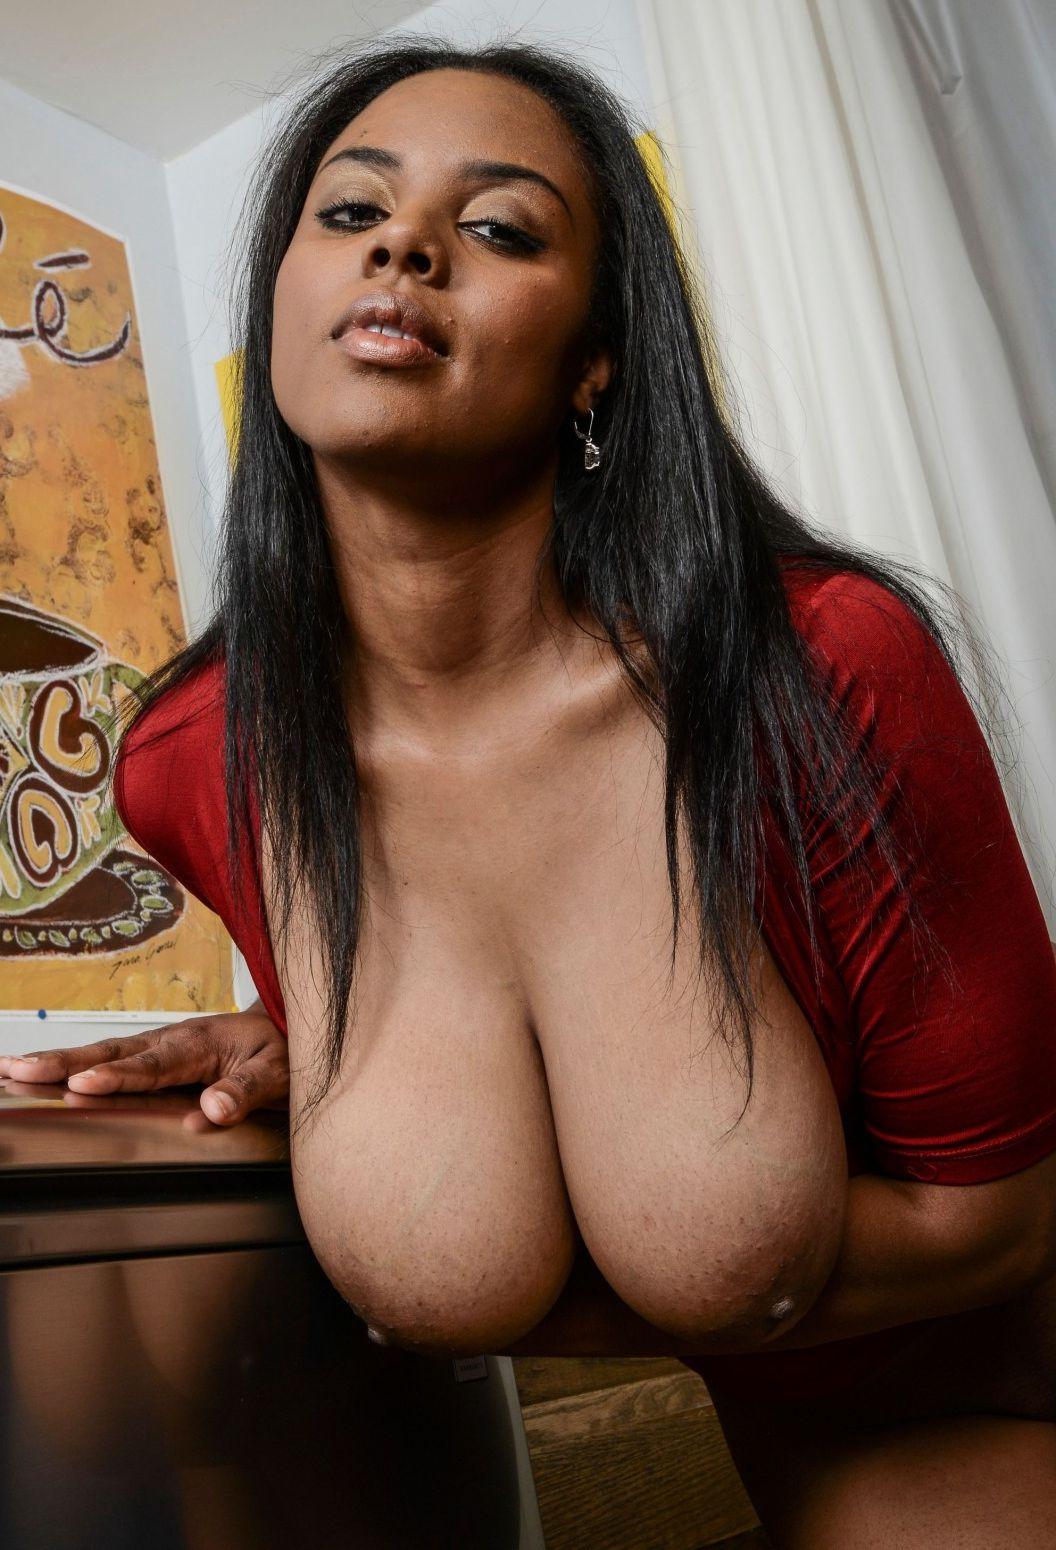 Fucking Images Of Alia Bhat alia starr's hangers porn pic - eporner